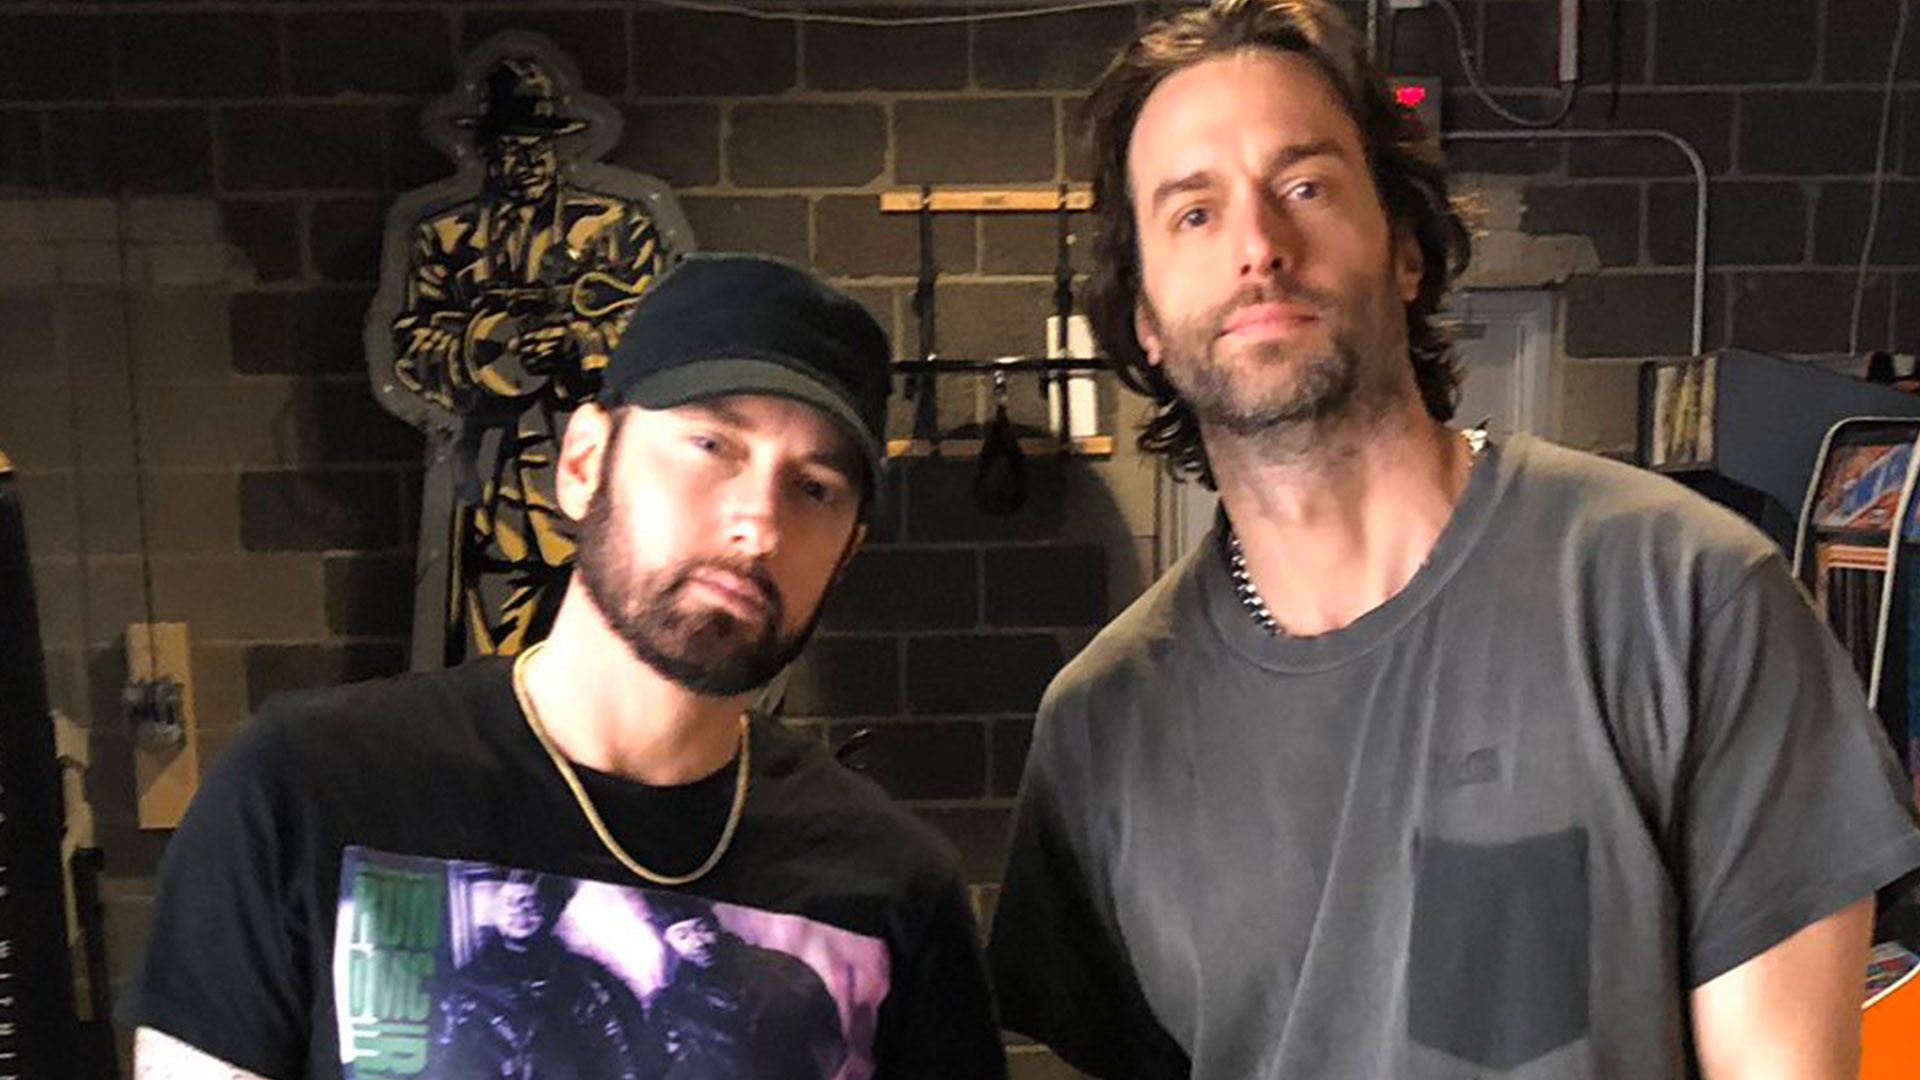 2019.11.08 - Eminem and Chris D'Elia